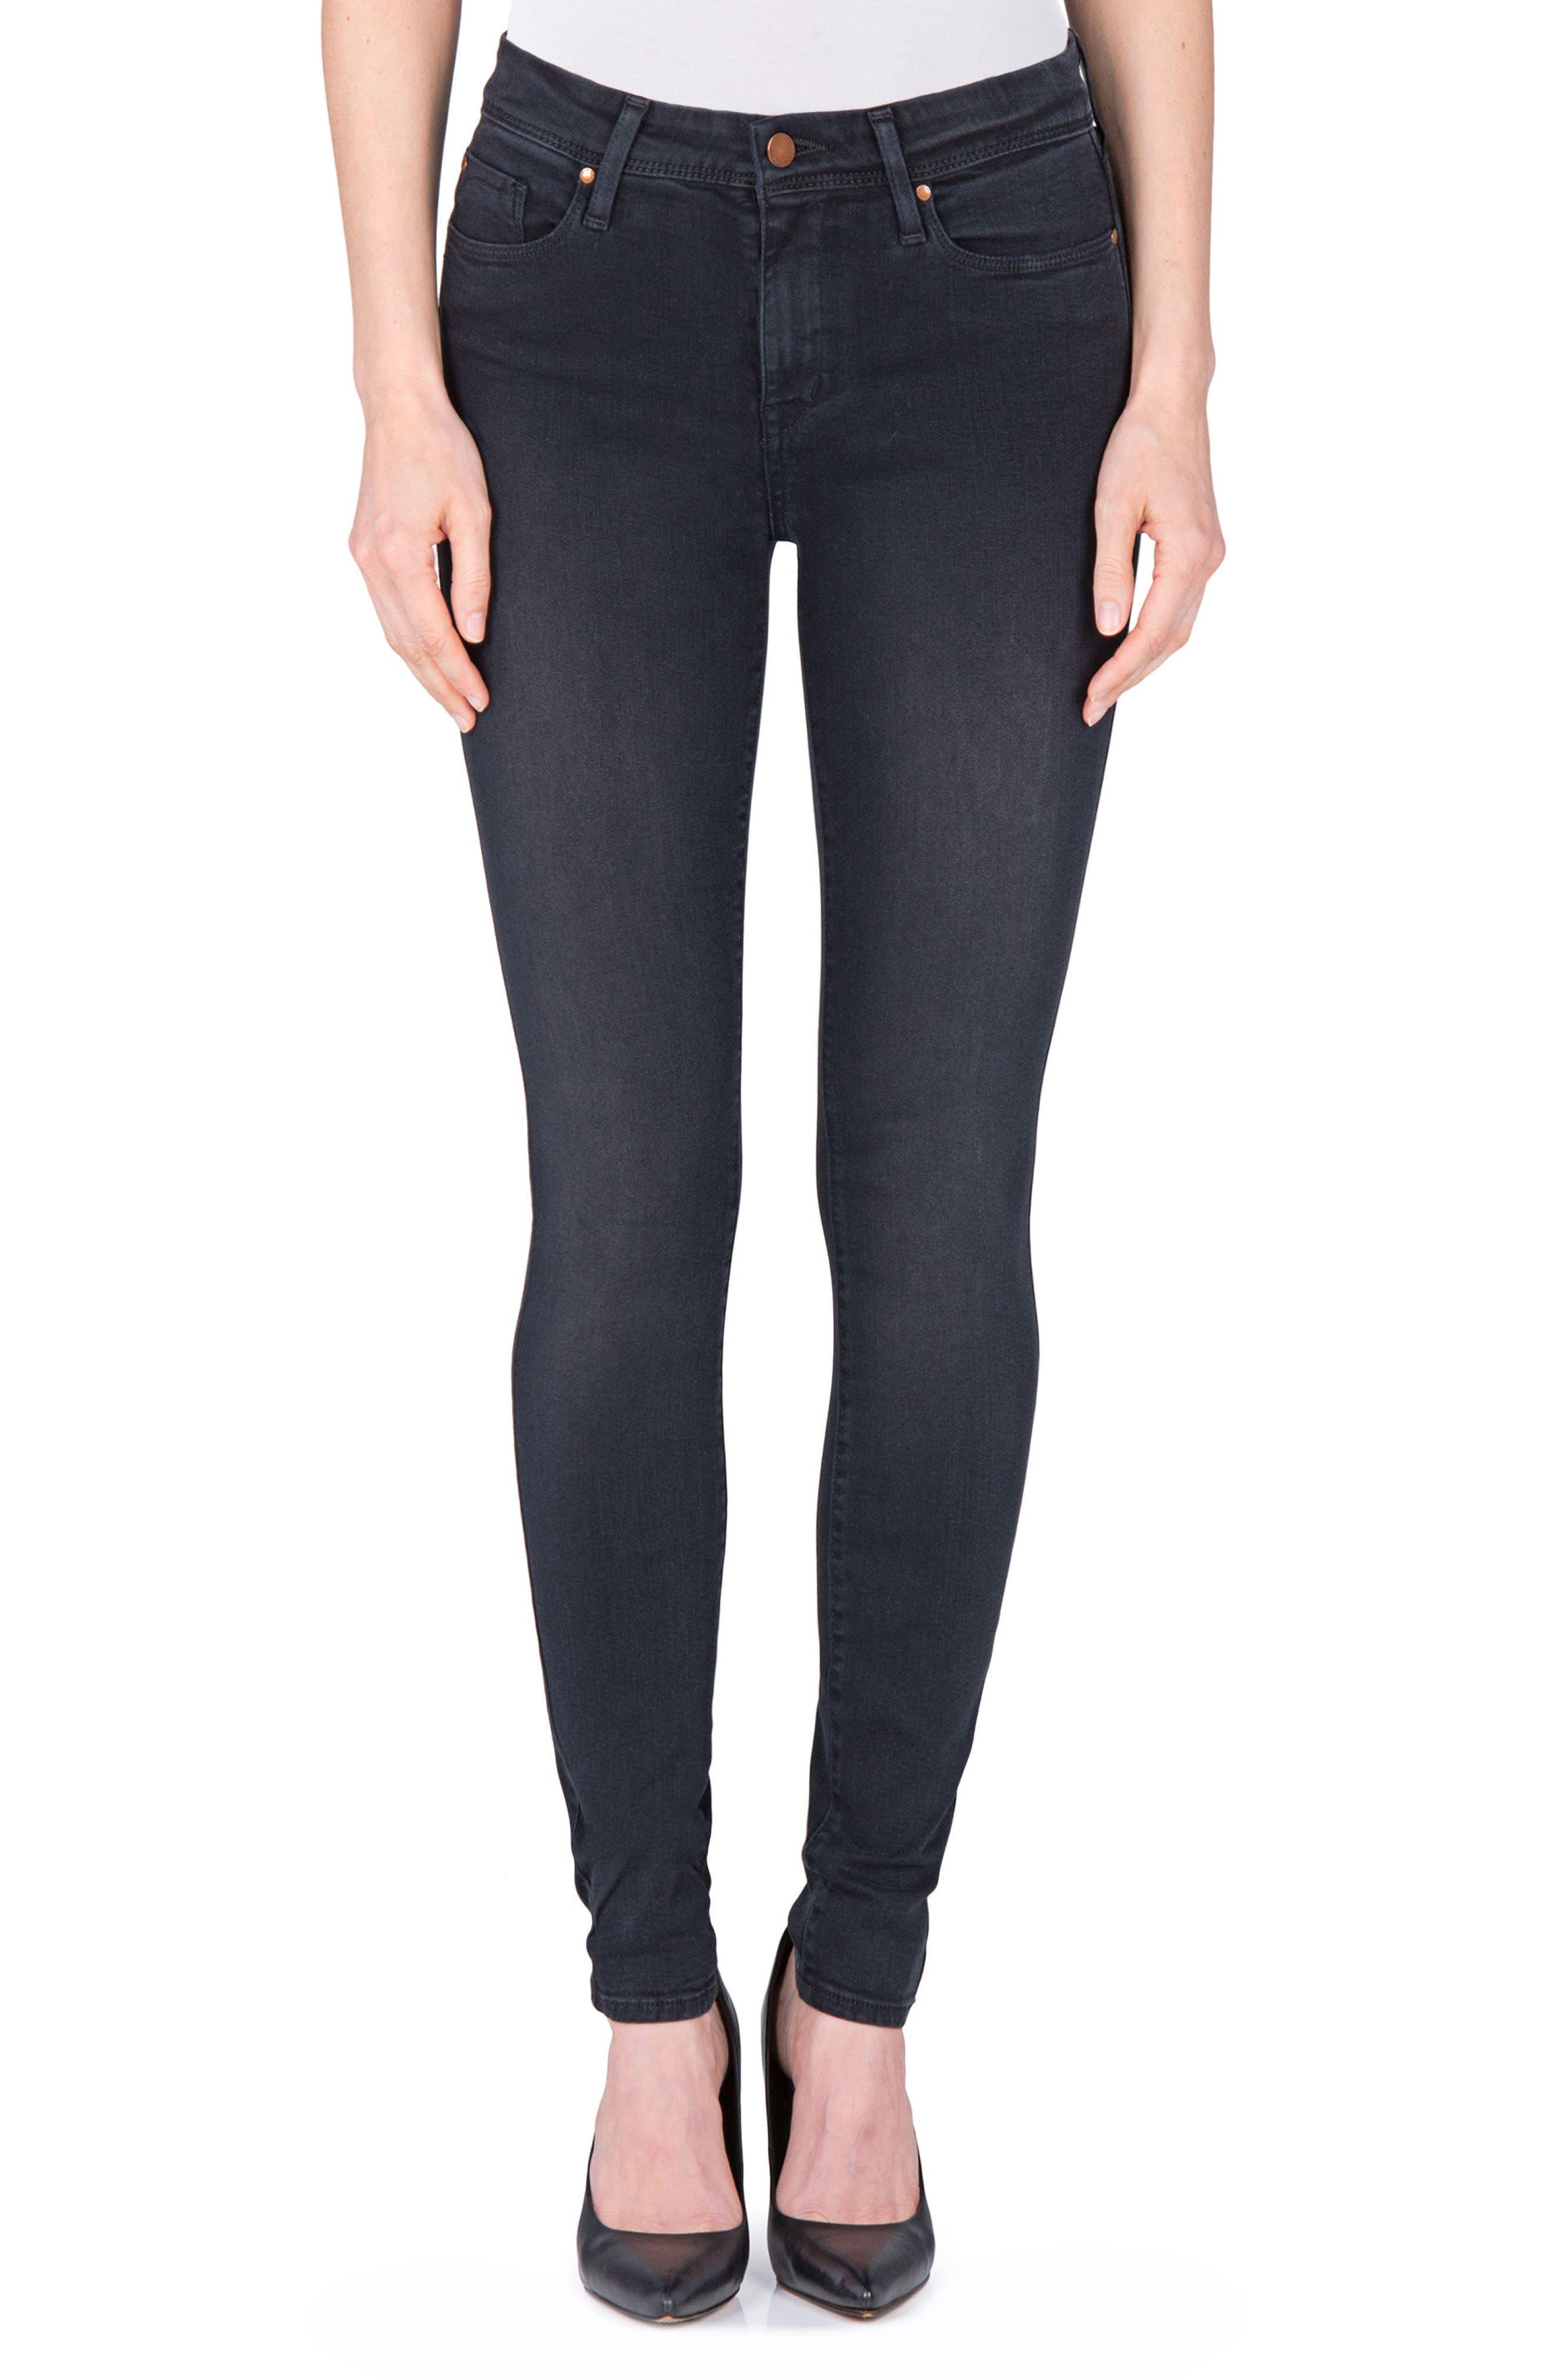 FIDELITY DENIM Belvedere Skinny Jeans